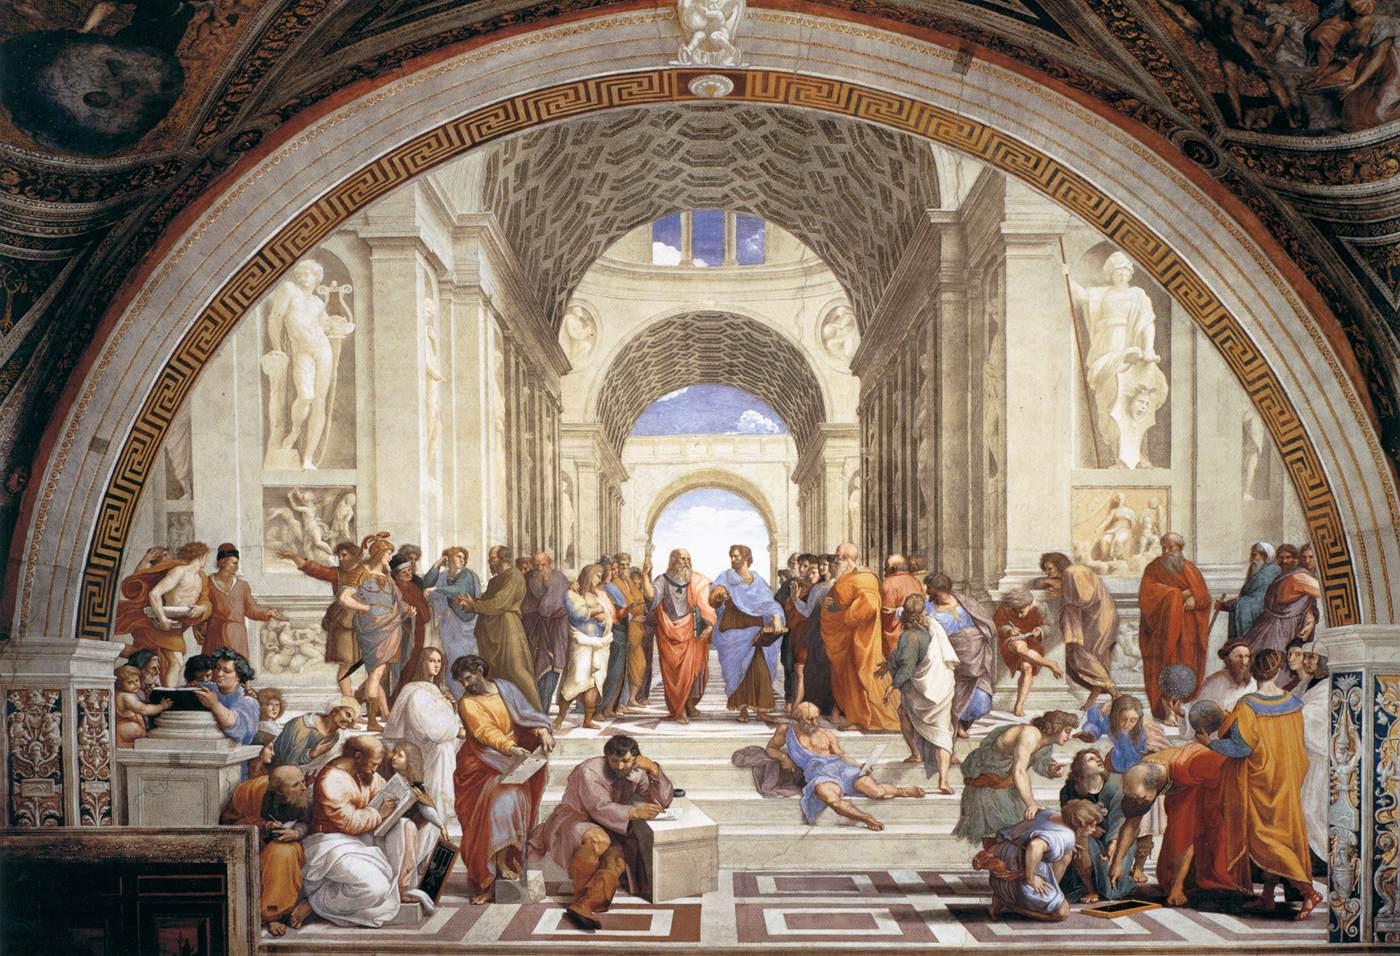 A Escola de Atenas, Rafael Sanzio, 1510-11, Sala das Assinaturas, Vaticano